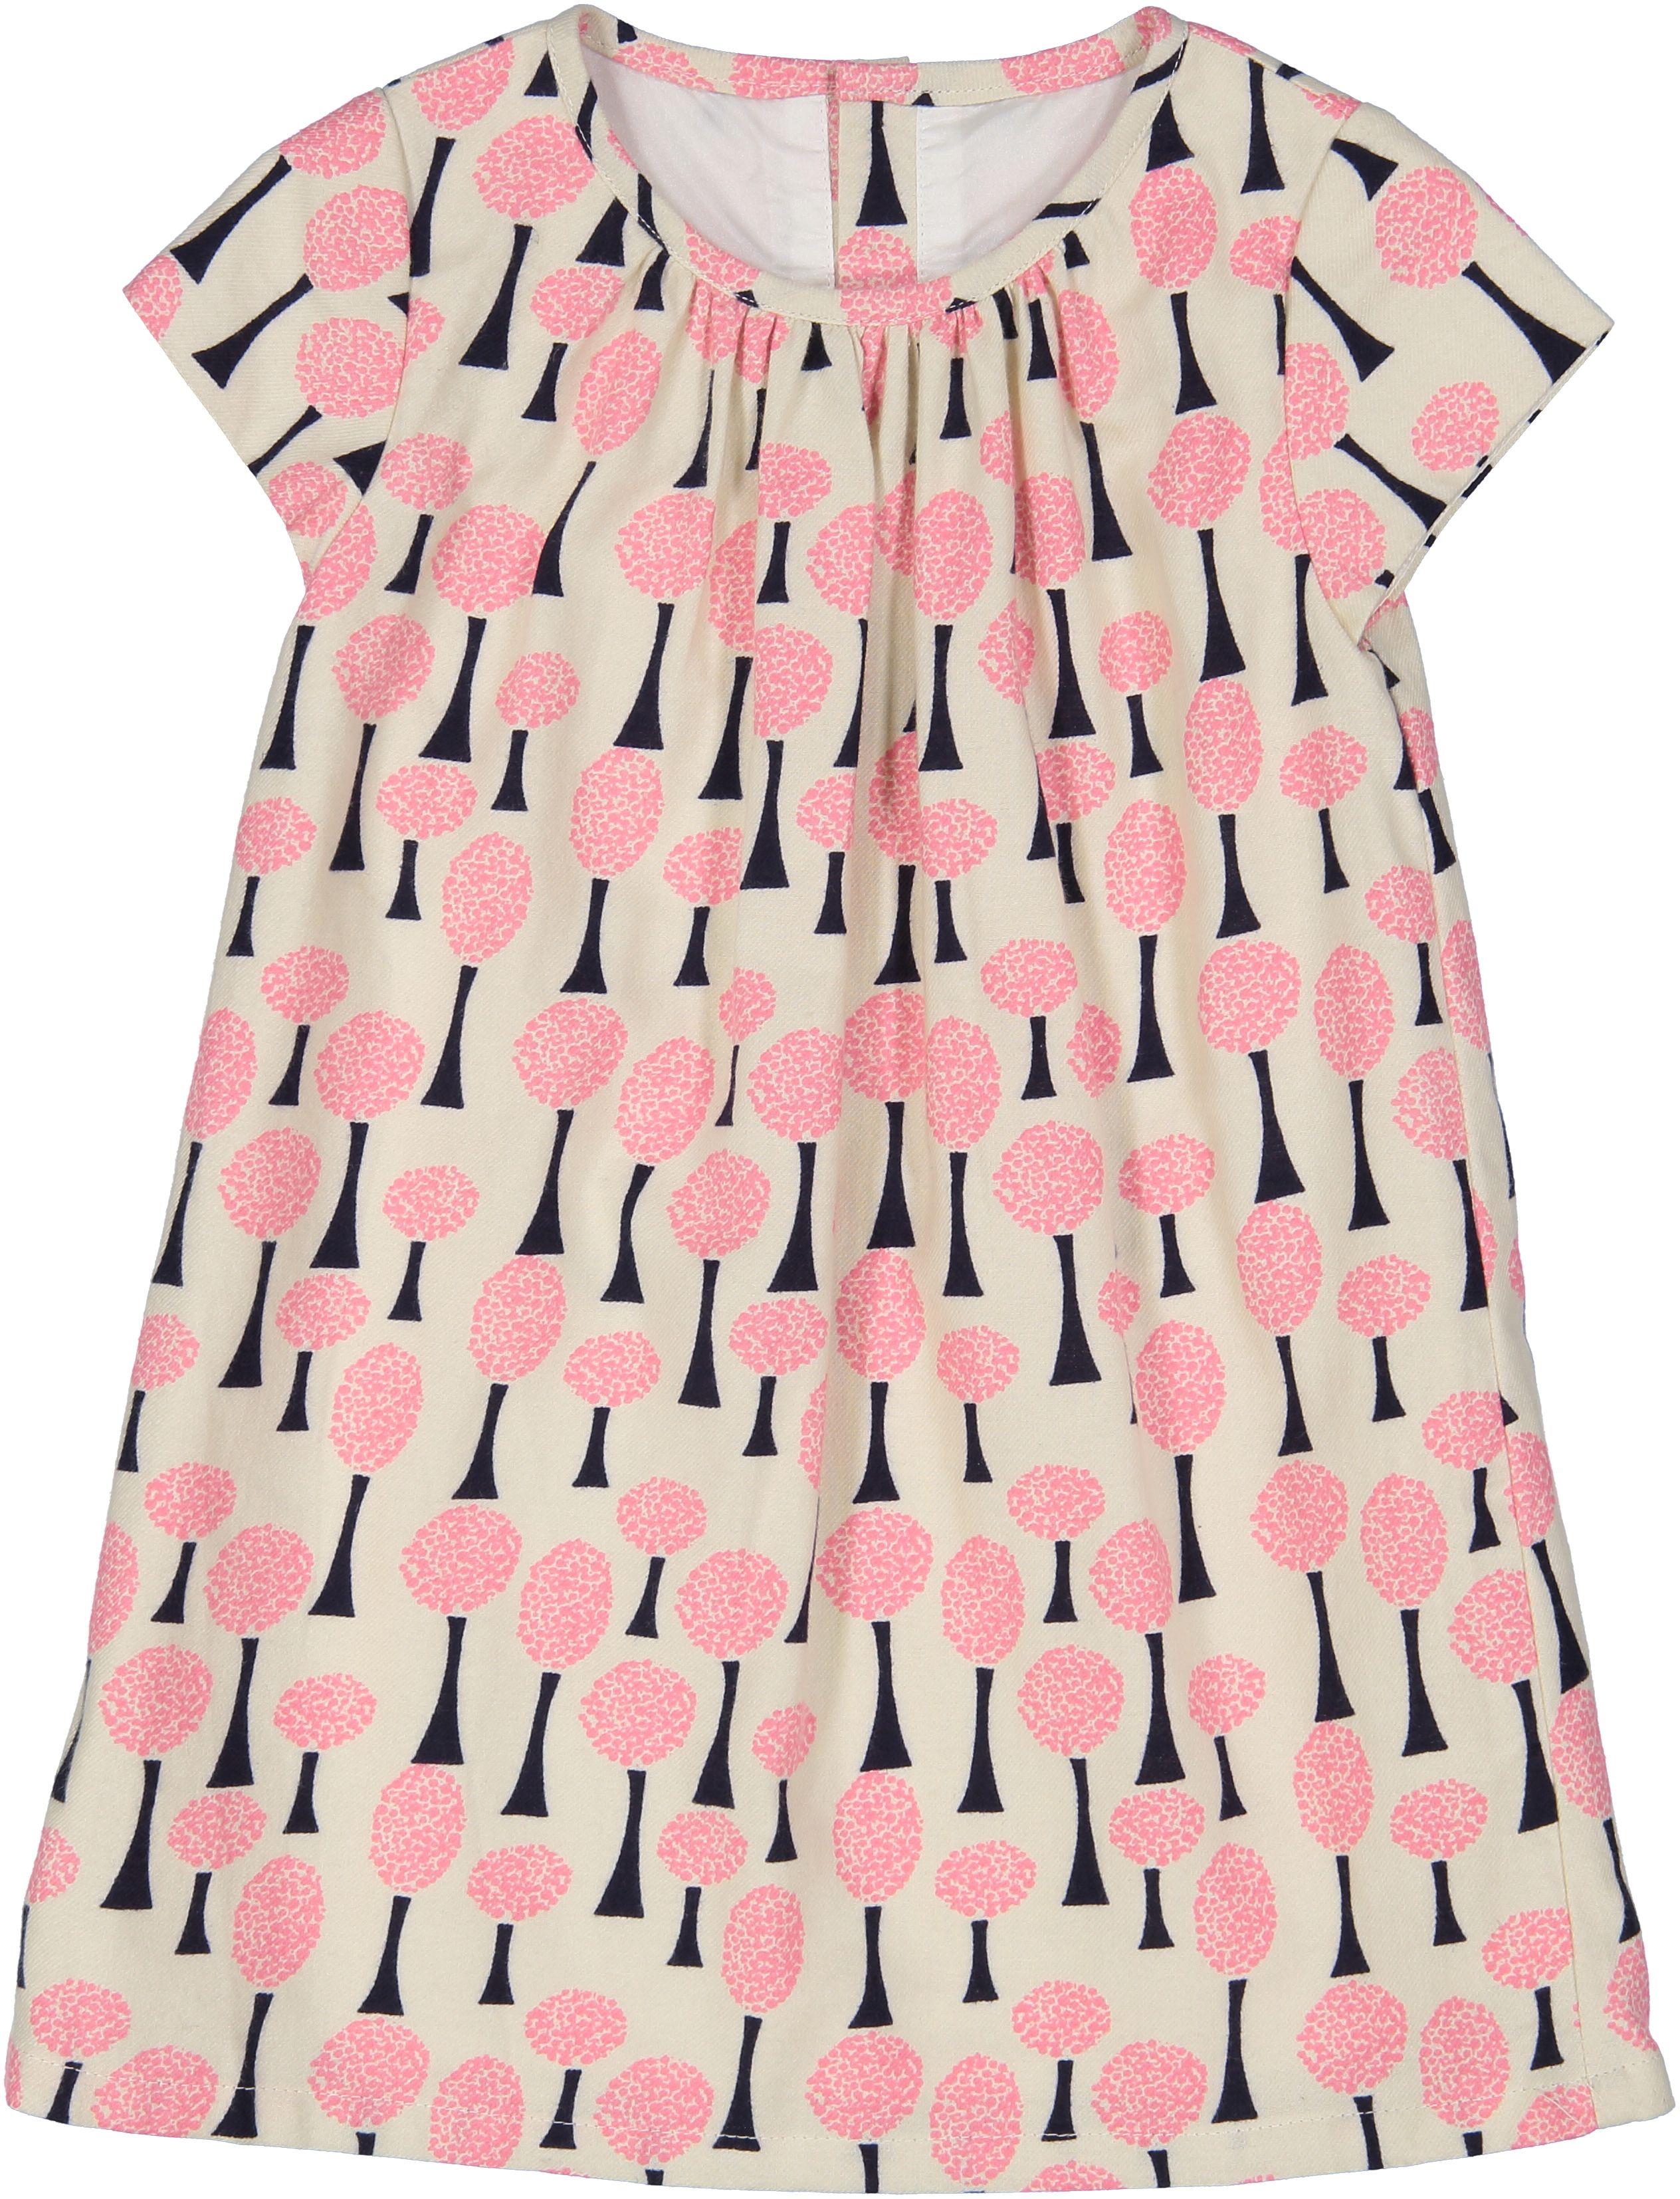 Toddler Girl Cream & Pink Tree Print A-Line Dress